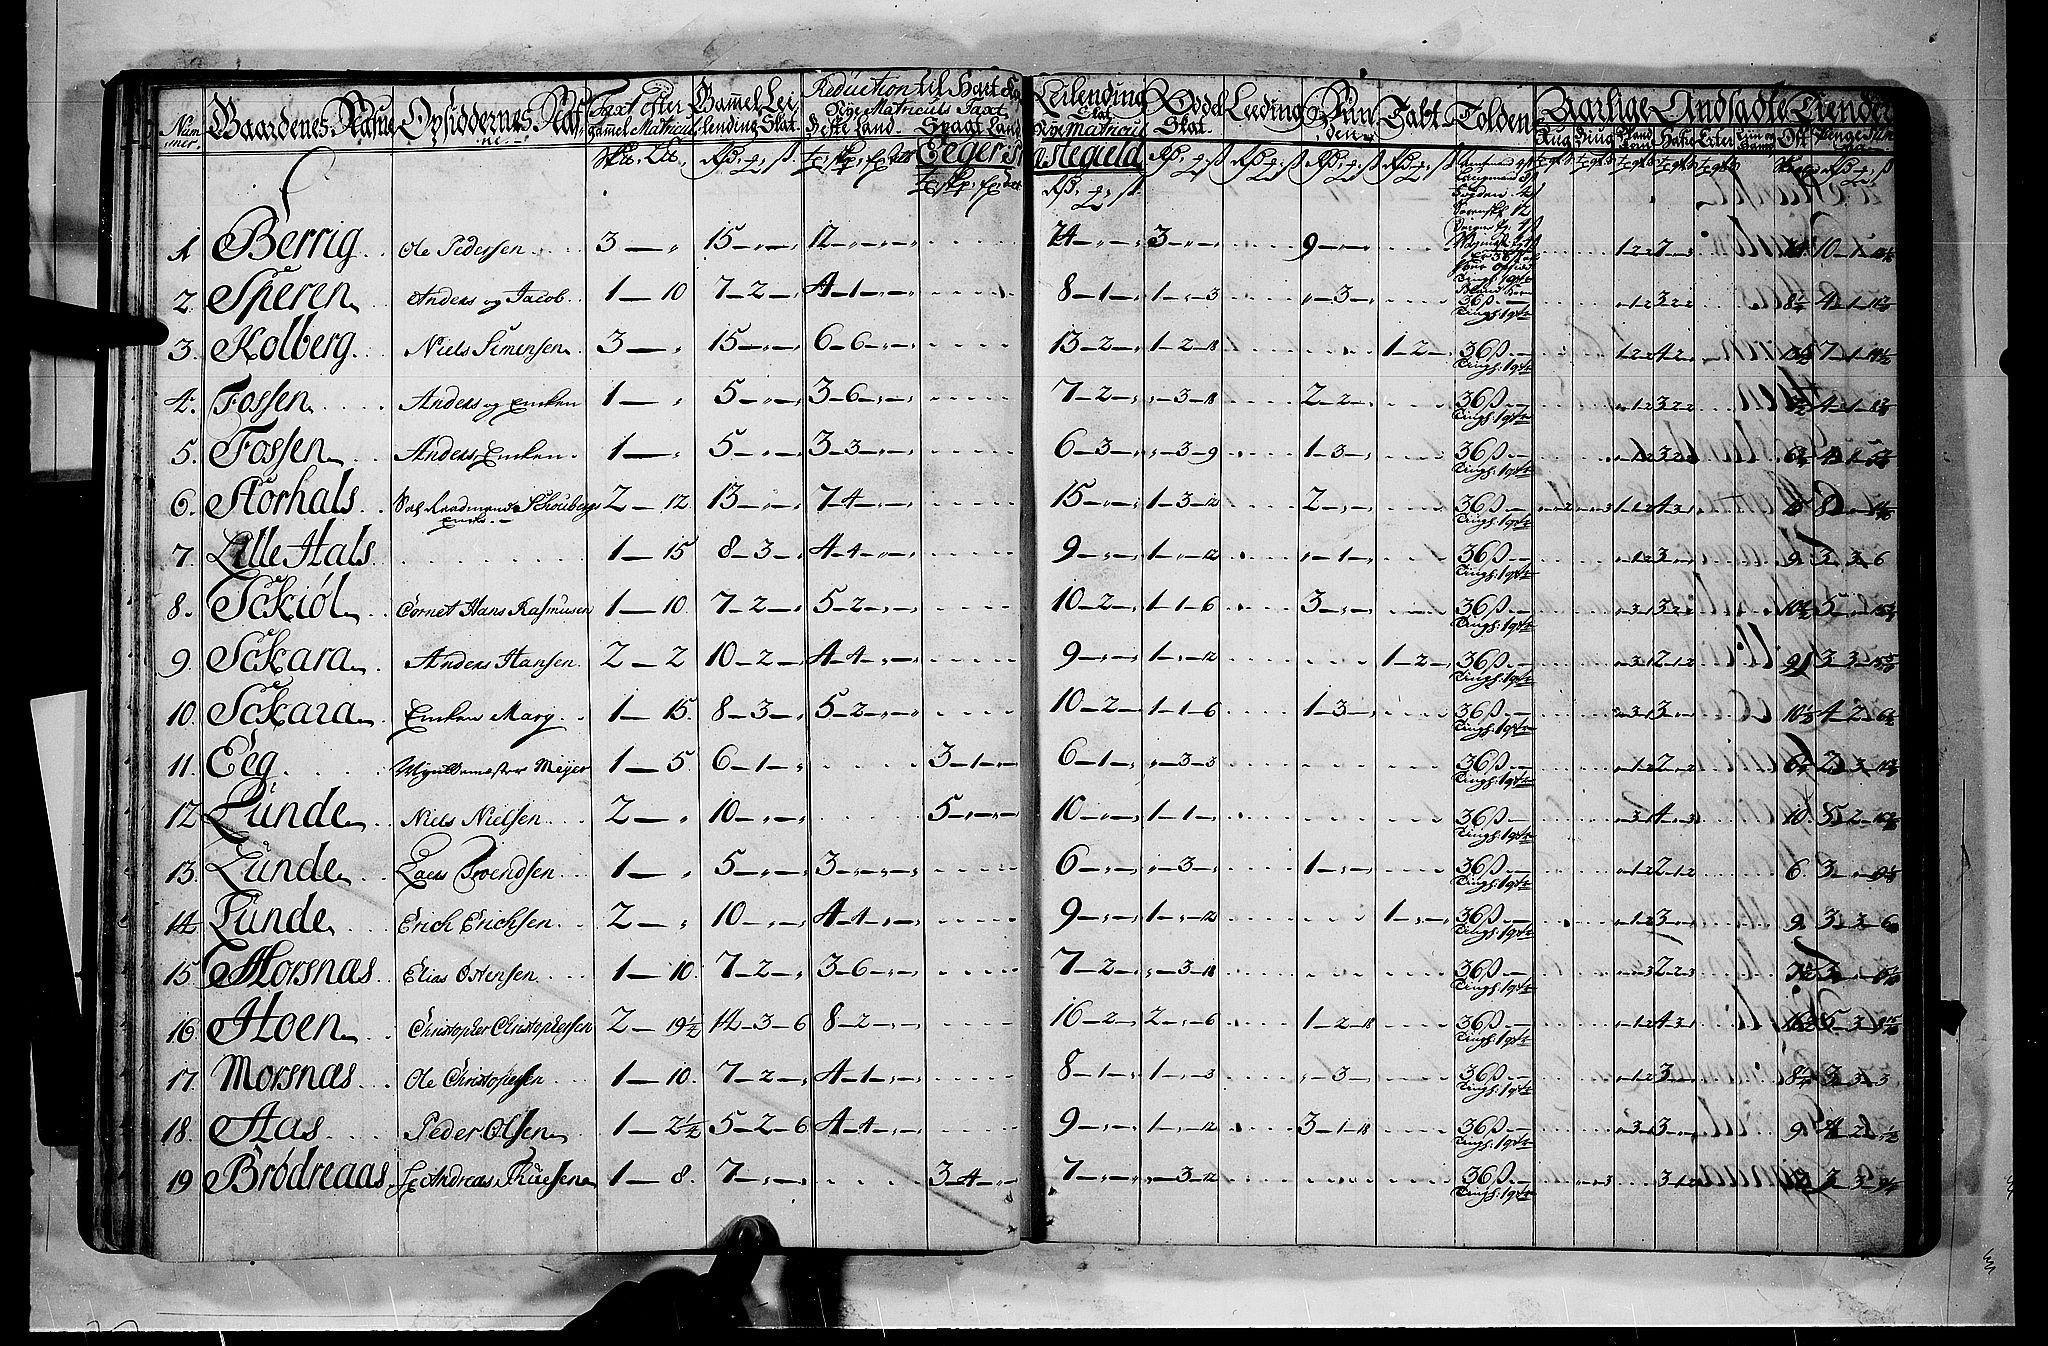 RA, Rentekammeret inntil 1814, Realistisk ordnet avdeling, N/Nb/Nbf/L0112: Buskerud matrikkelprotokoll, 1723, s. 21b-22a